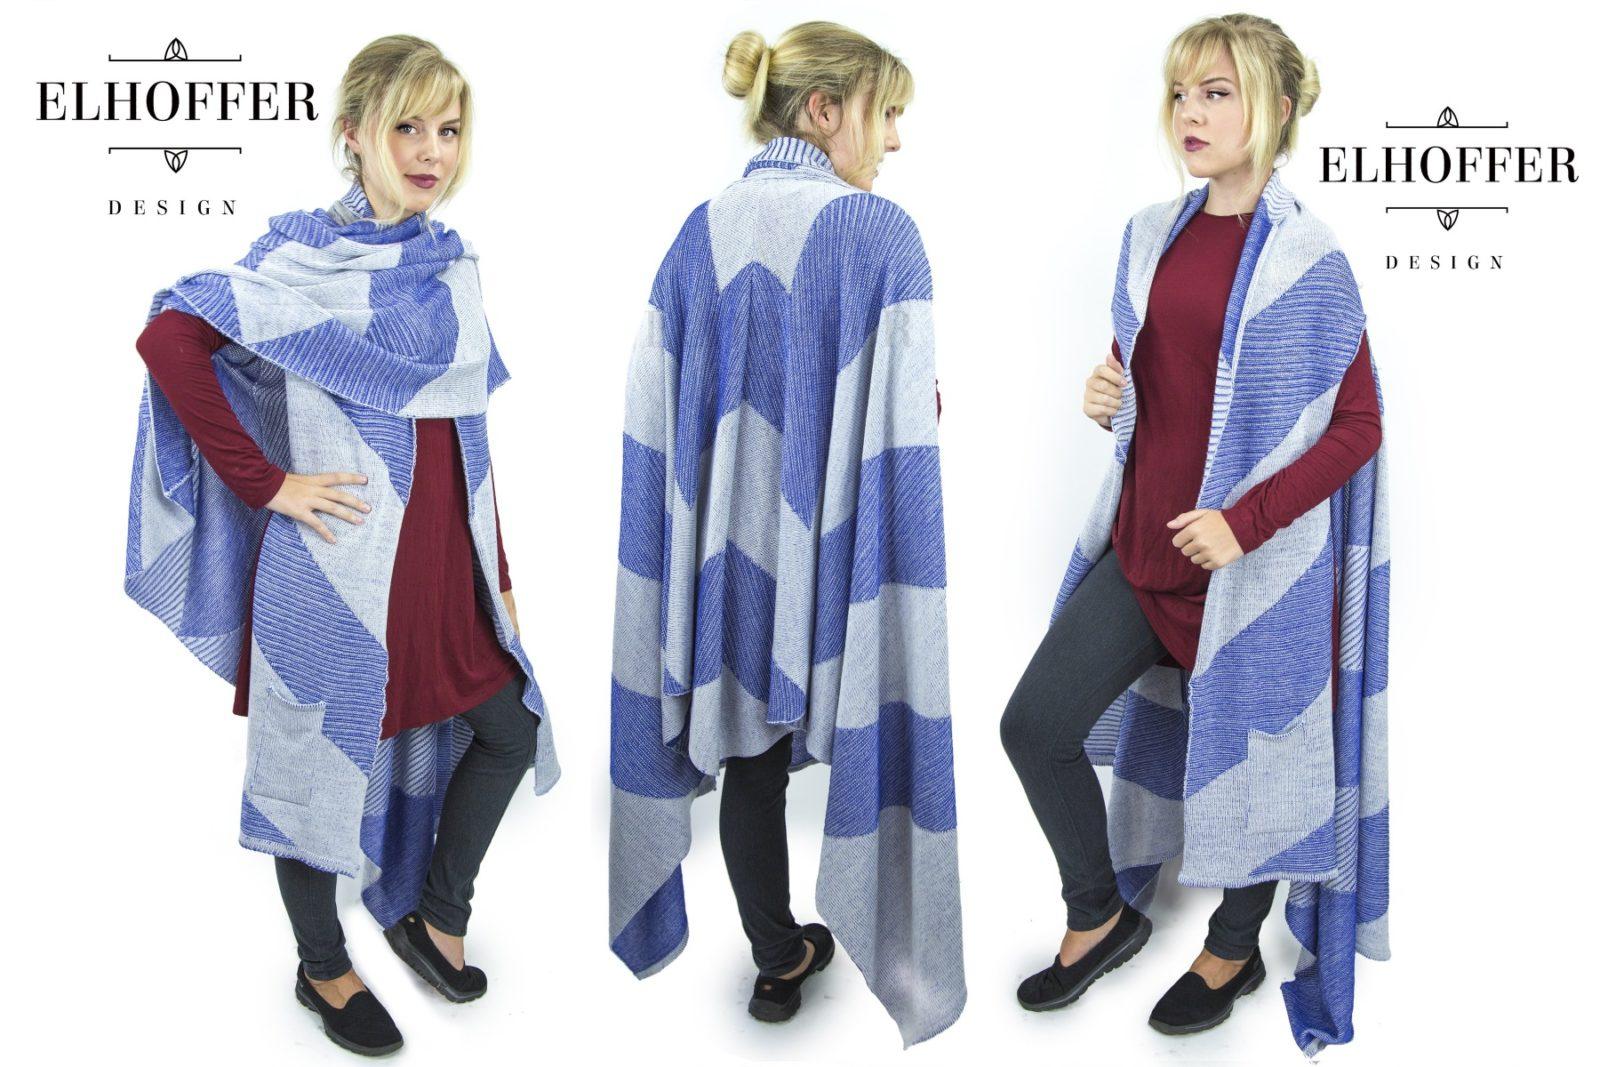 Ahsoka Inspired Cardigan by Elhoffer Design